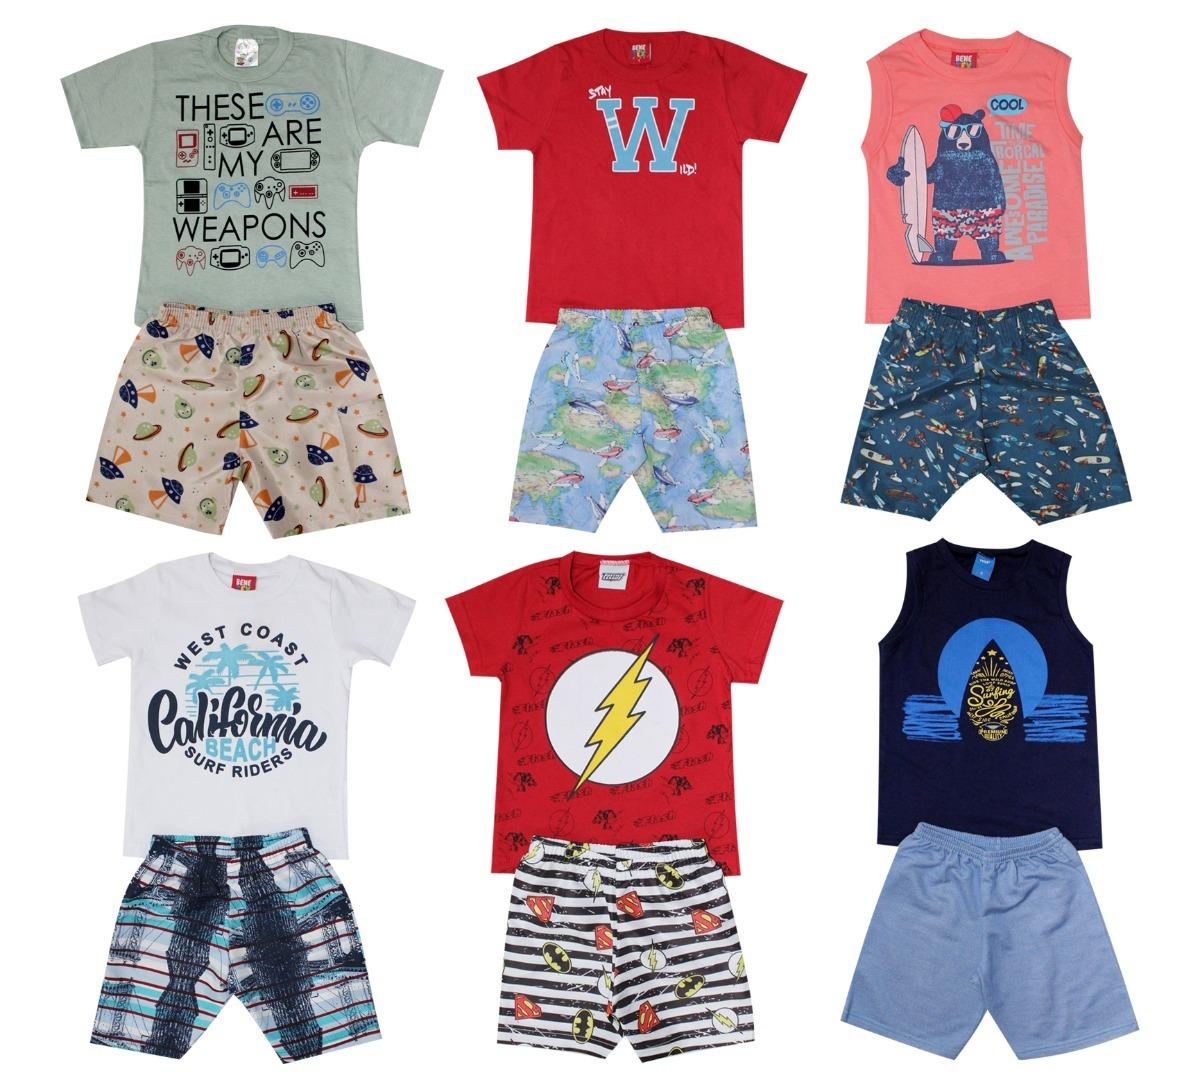 c1f7adc7c2 kit lote 7 conjuntos infantil roupa menino atacado 1ao8. Carregando zoom.